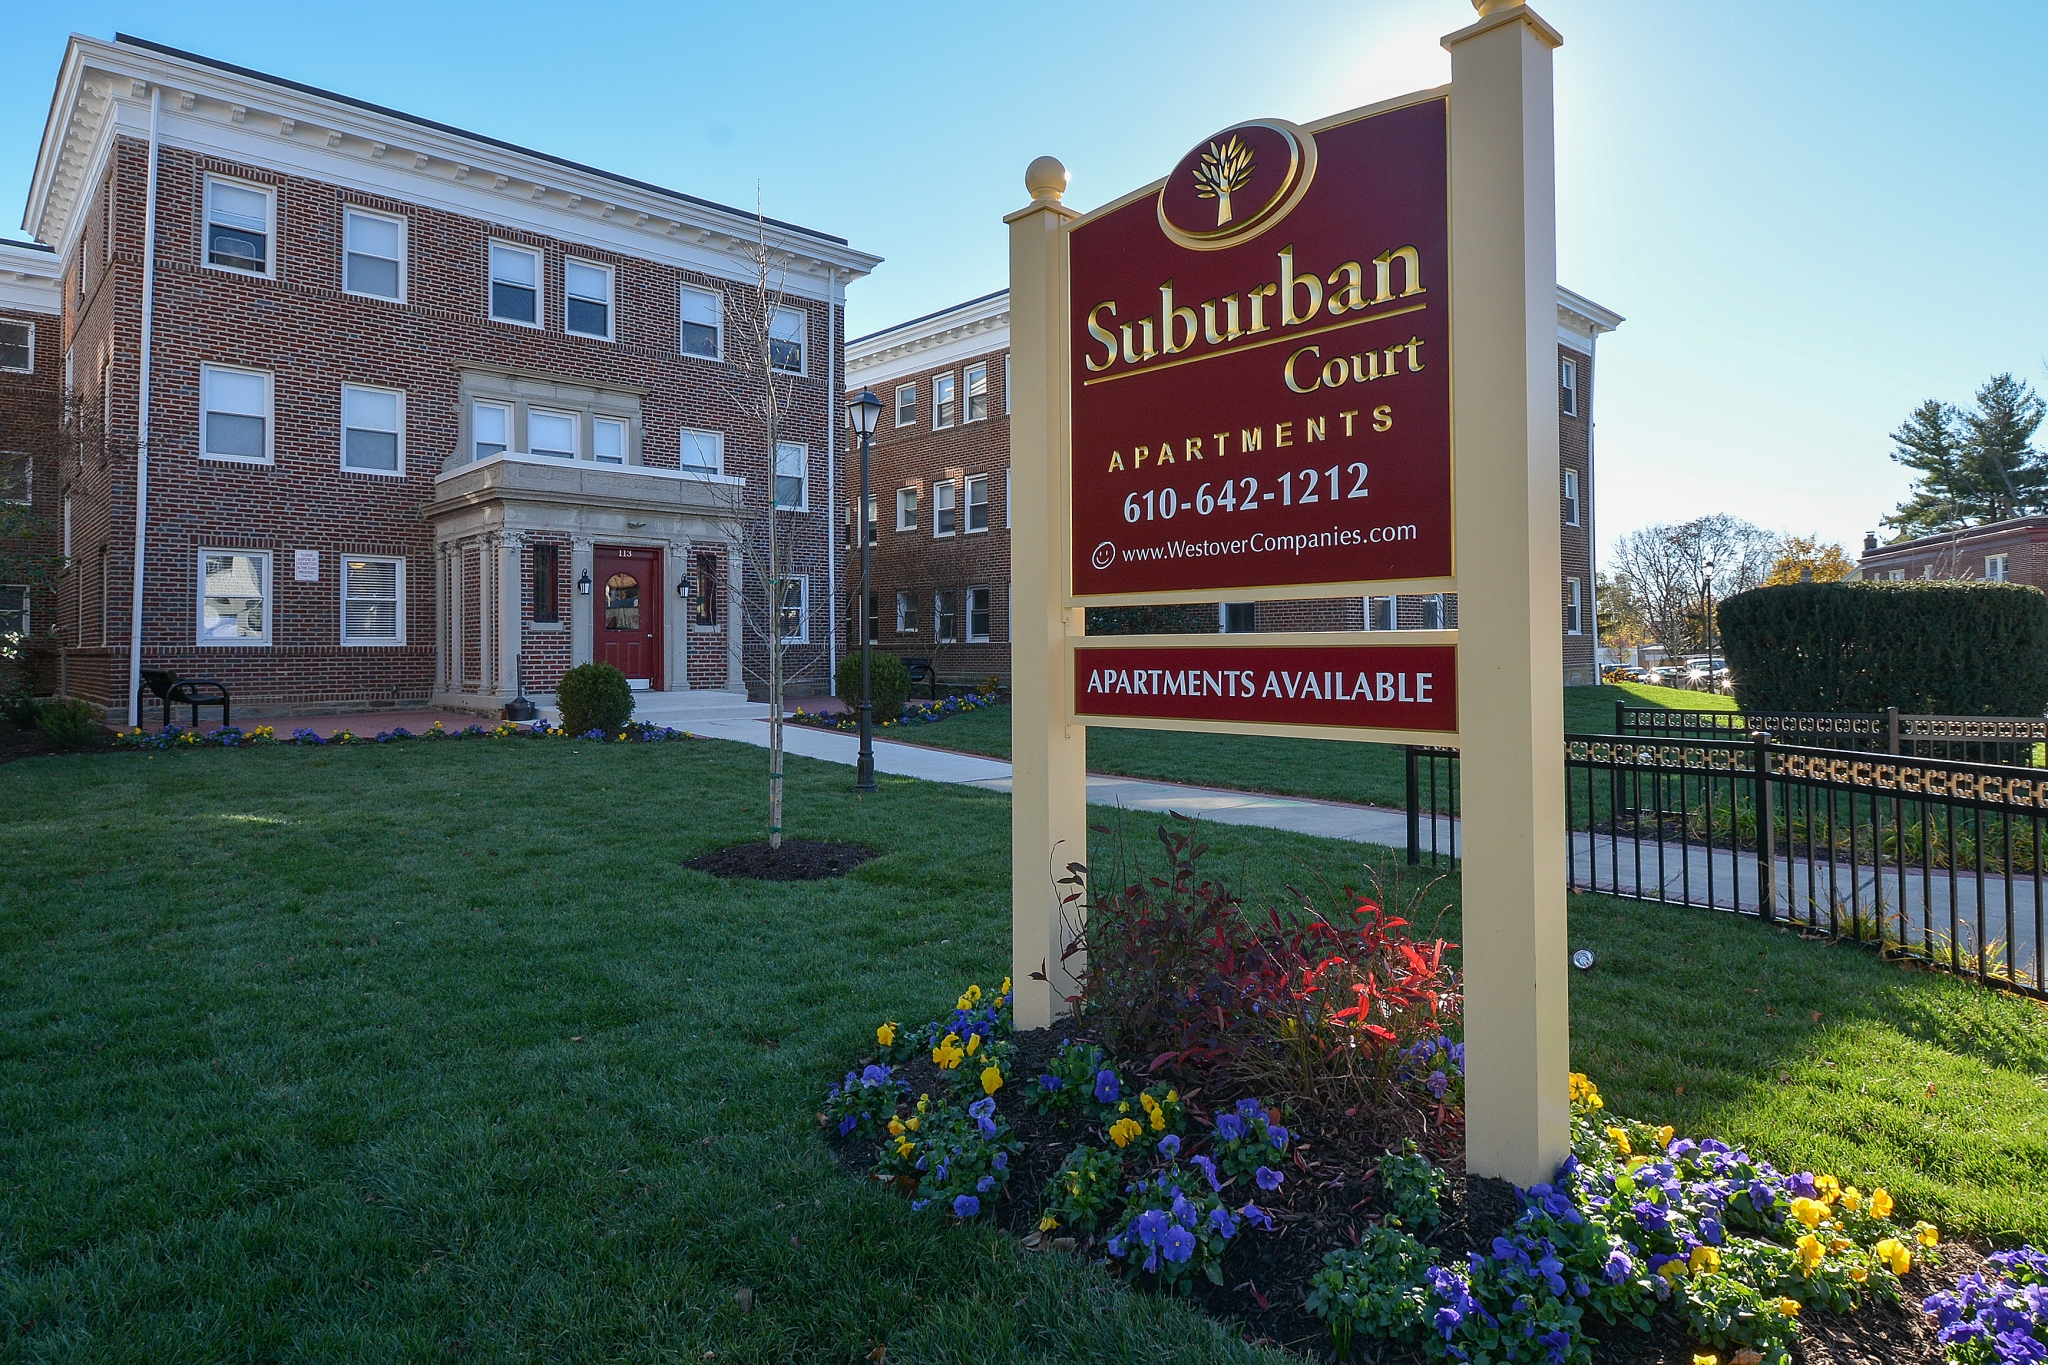 Suburban Court Apartments image 0